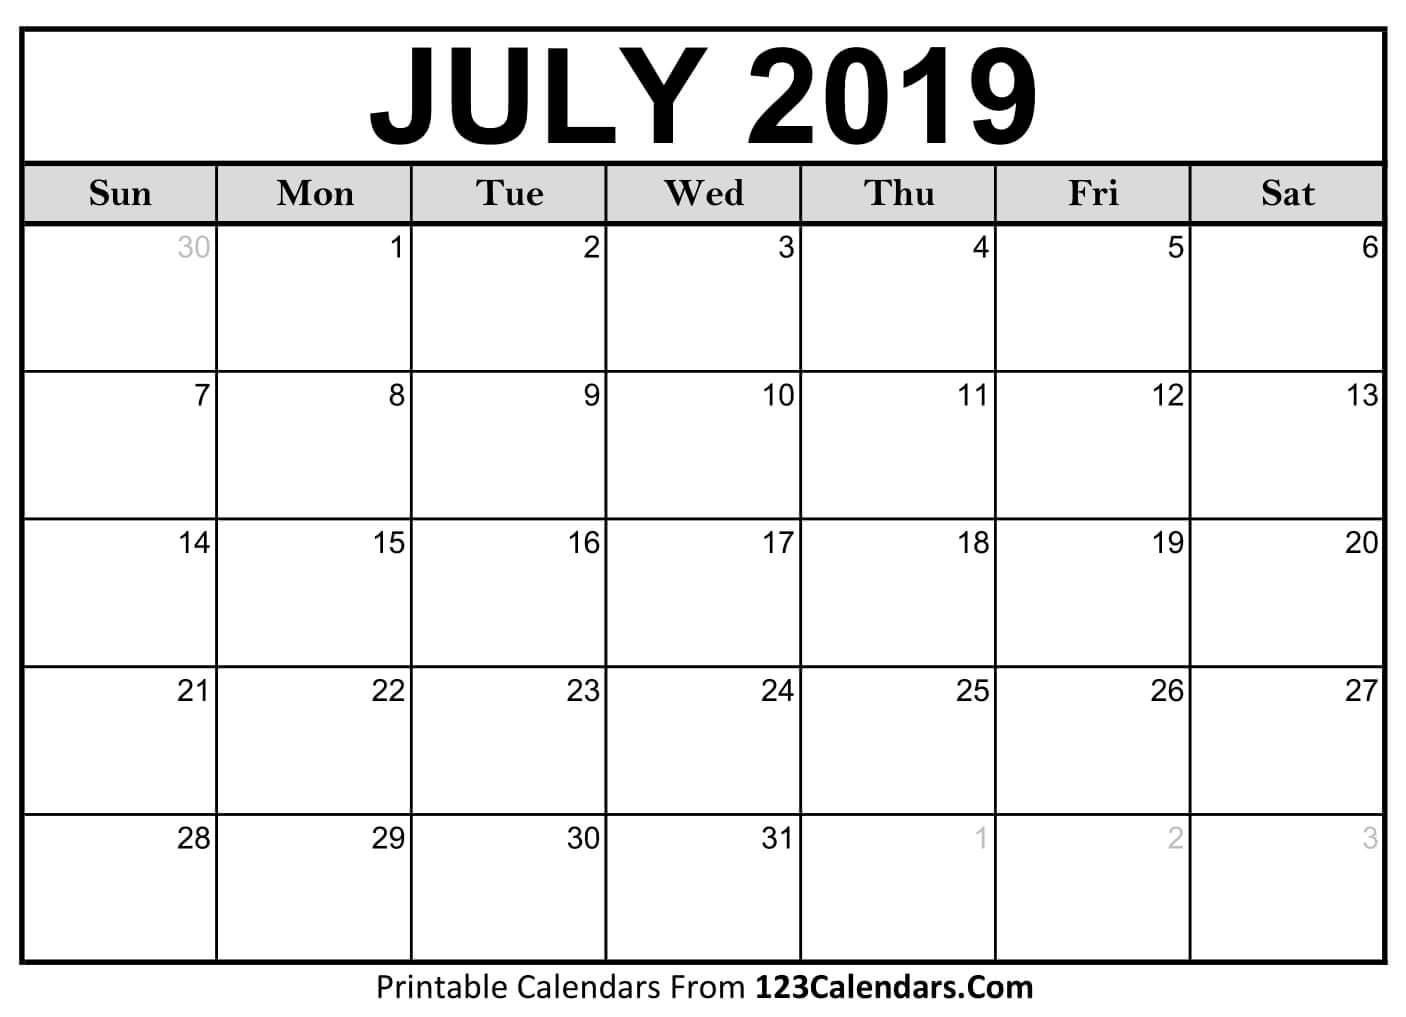 Printable Calendar July 2019